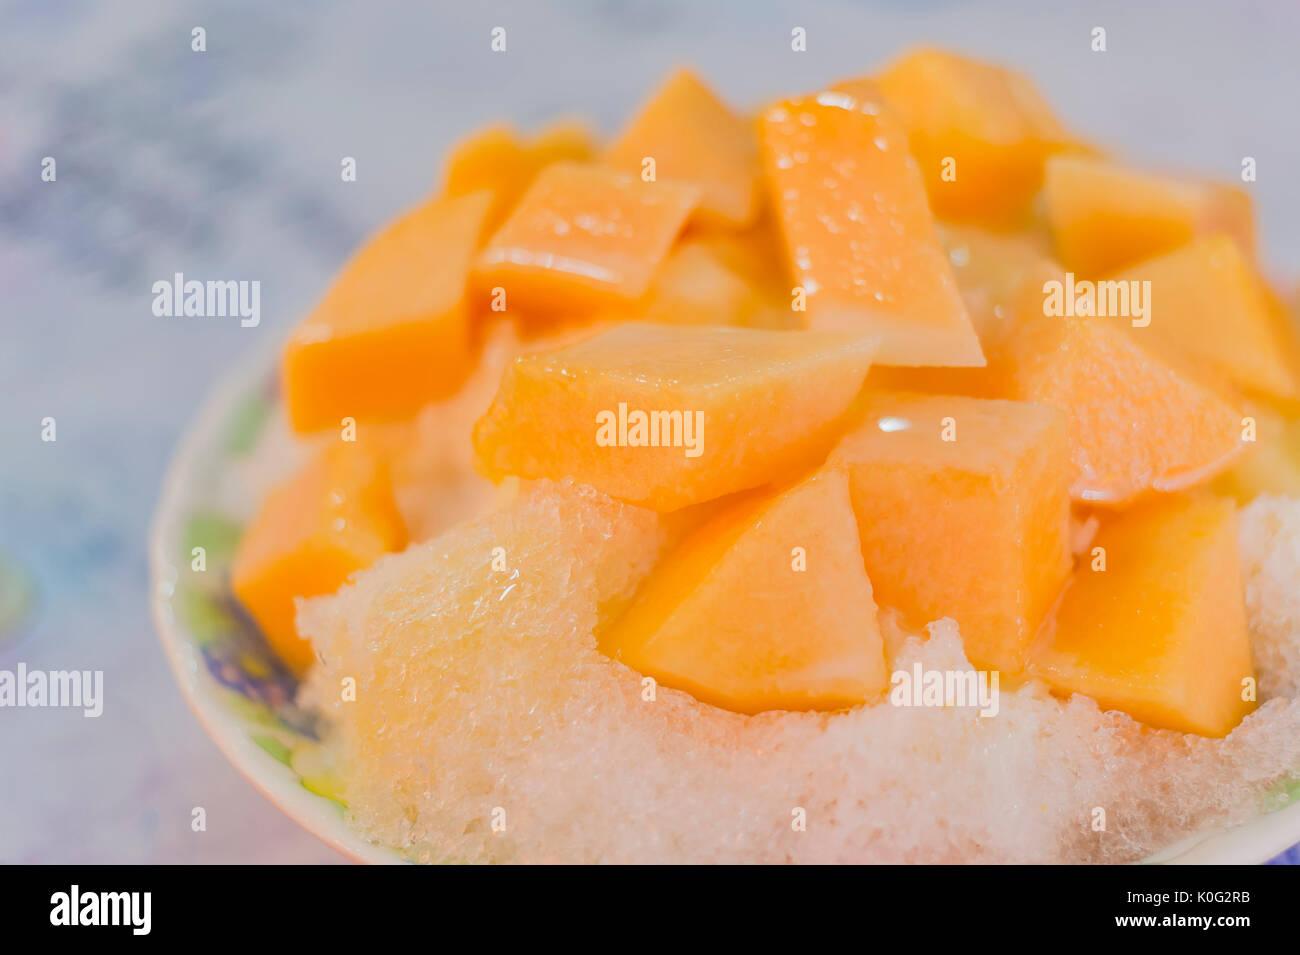 Taiwan Ice Stock Photos & Taiwan Ice Stock Images - Alamy